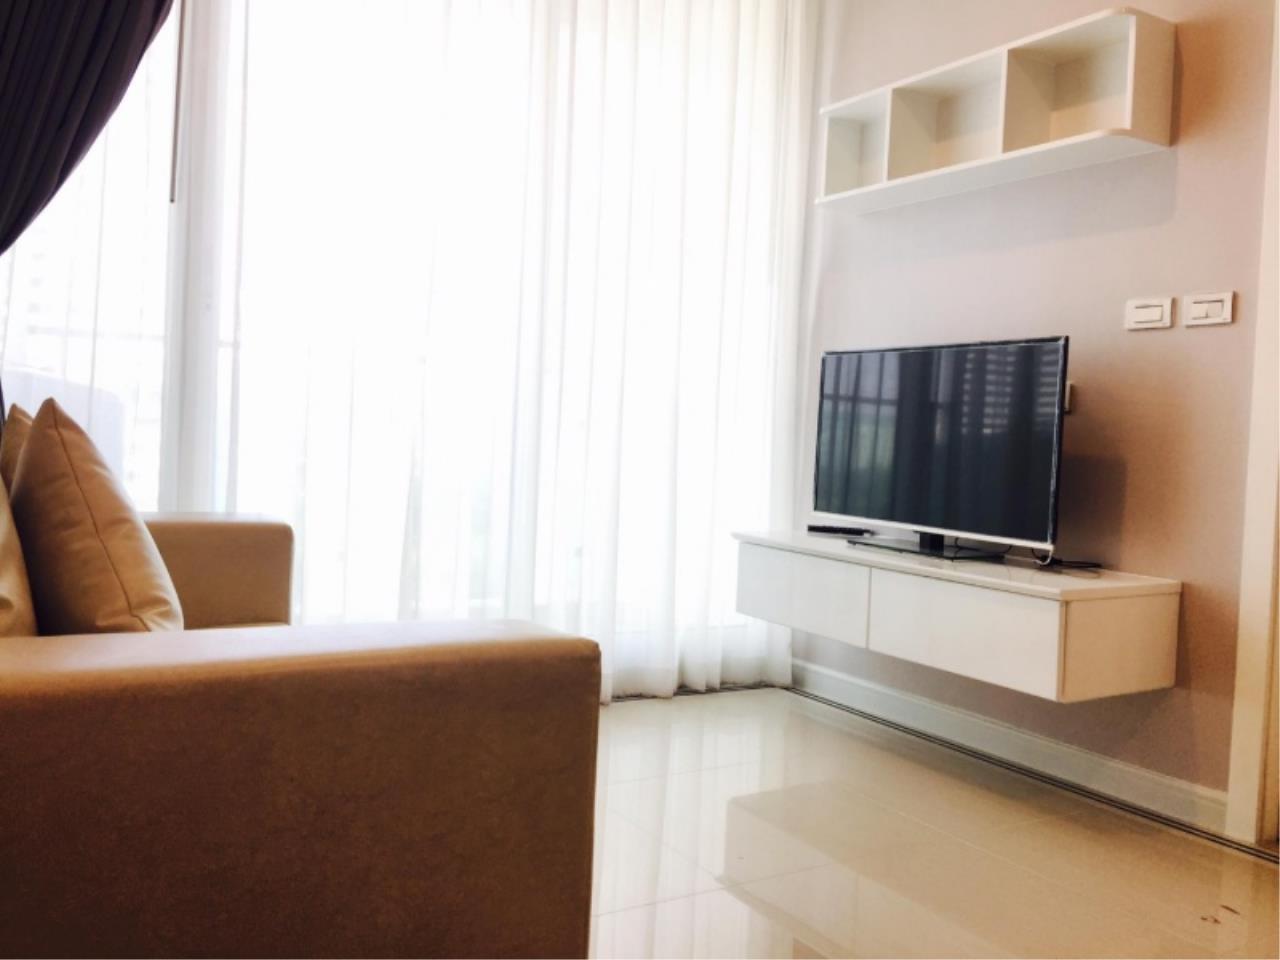 Century21 Skylux Agency's T.C. Green / Condo For Sale / 1 Bedroom / 35 SQM / MRT Phra Ram 9 / Bangkok 2